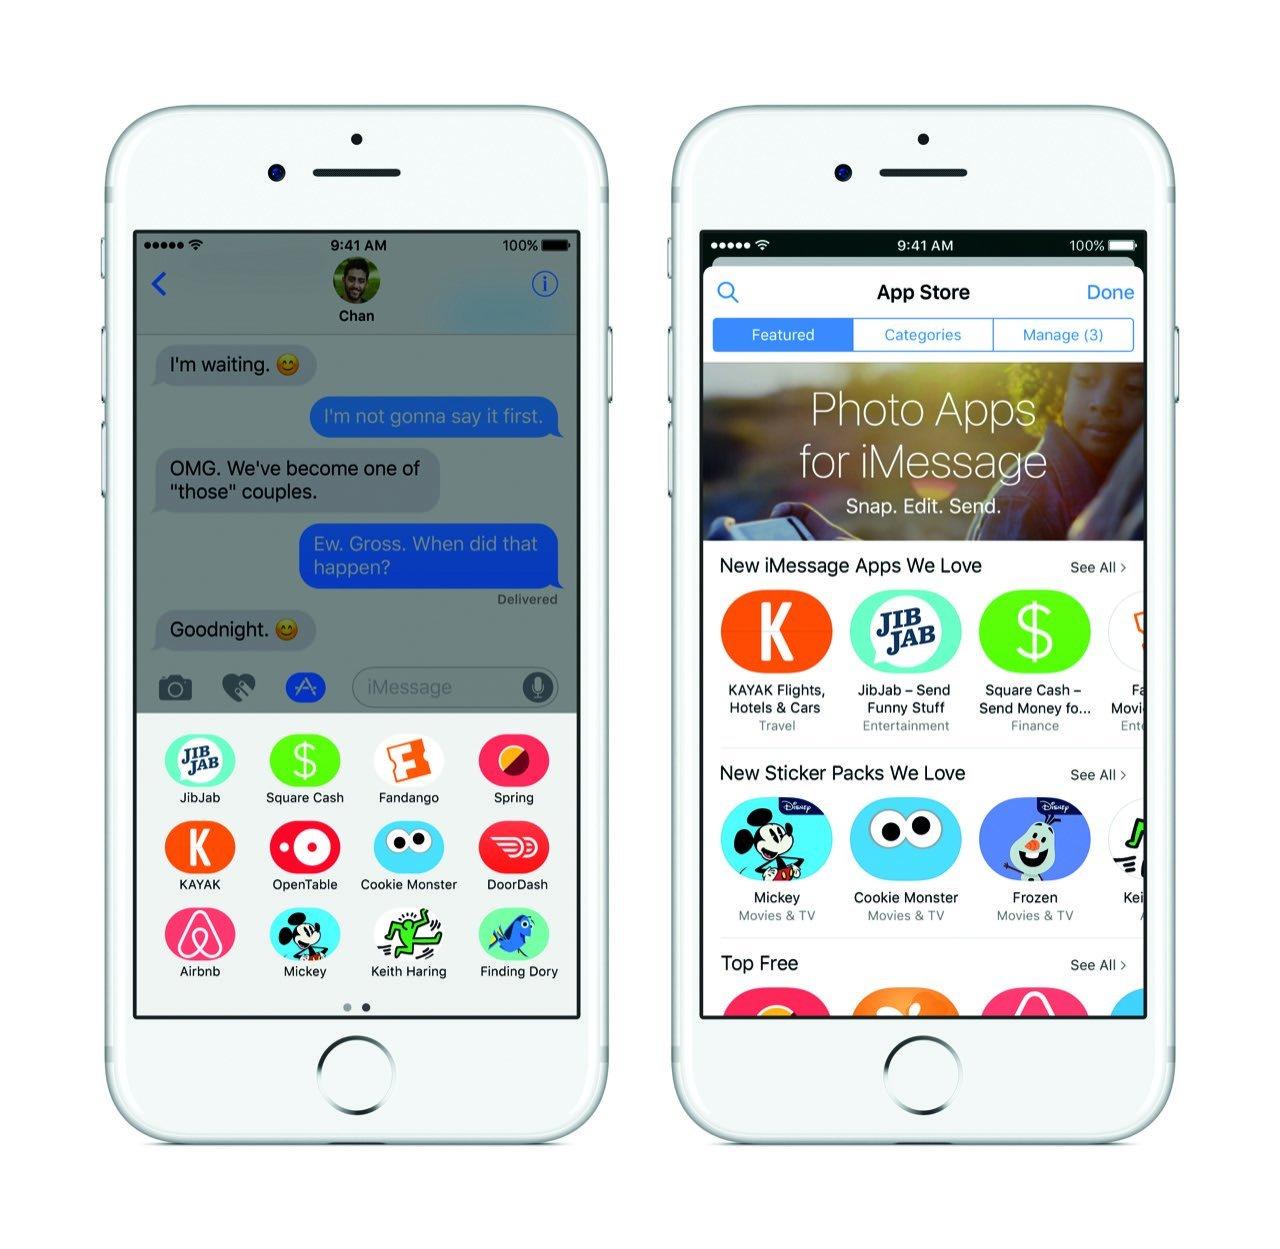 iOS iMessage App Store (iPhone 7)